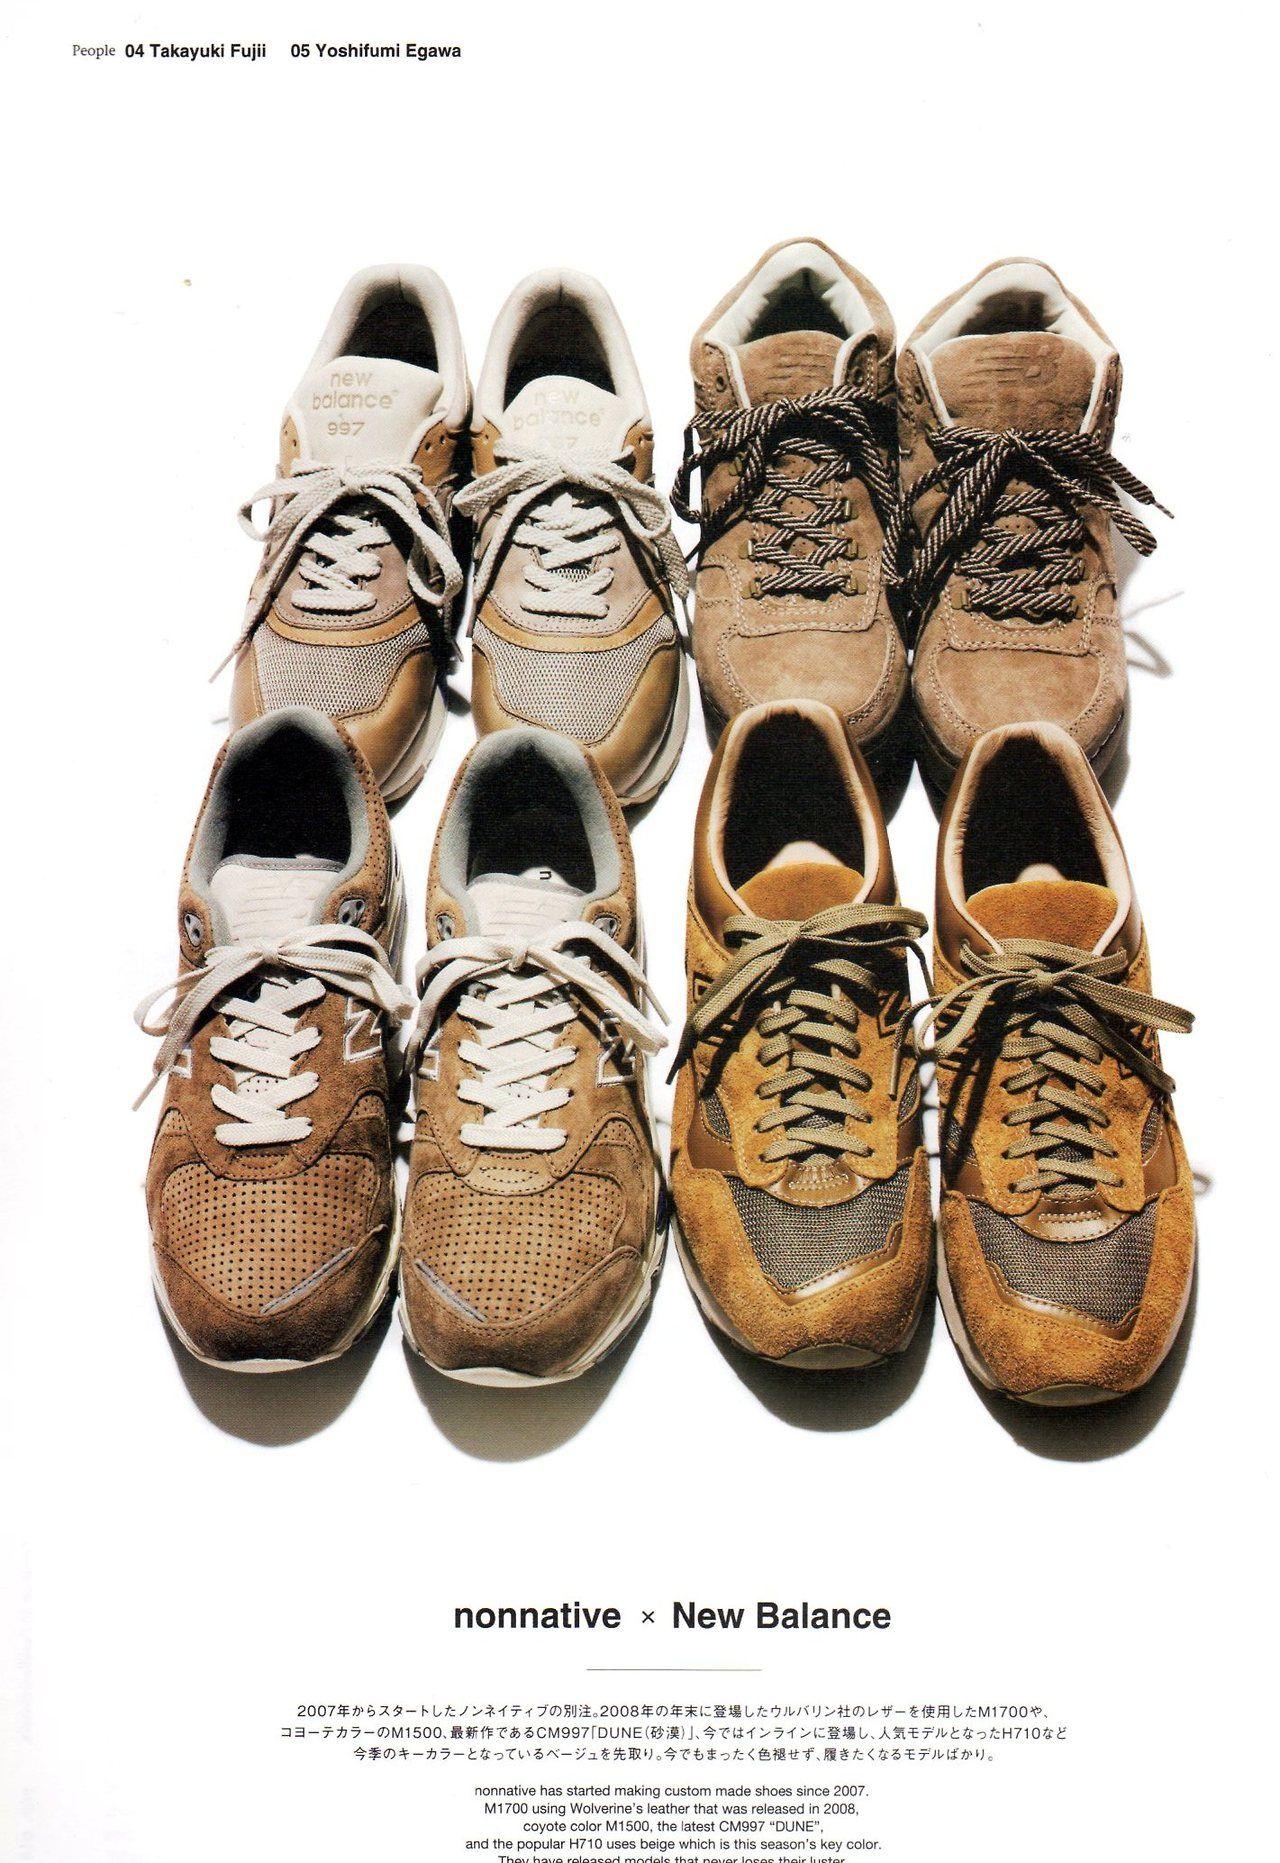 reputable site f4e71 81adb  nonnative  newbalance  nonnativenewbalance  shoes  sneakers  footwear